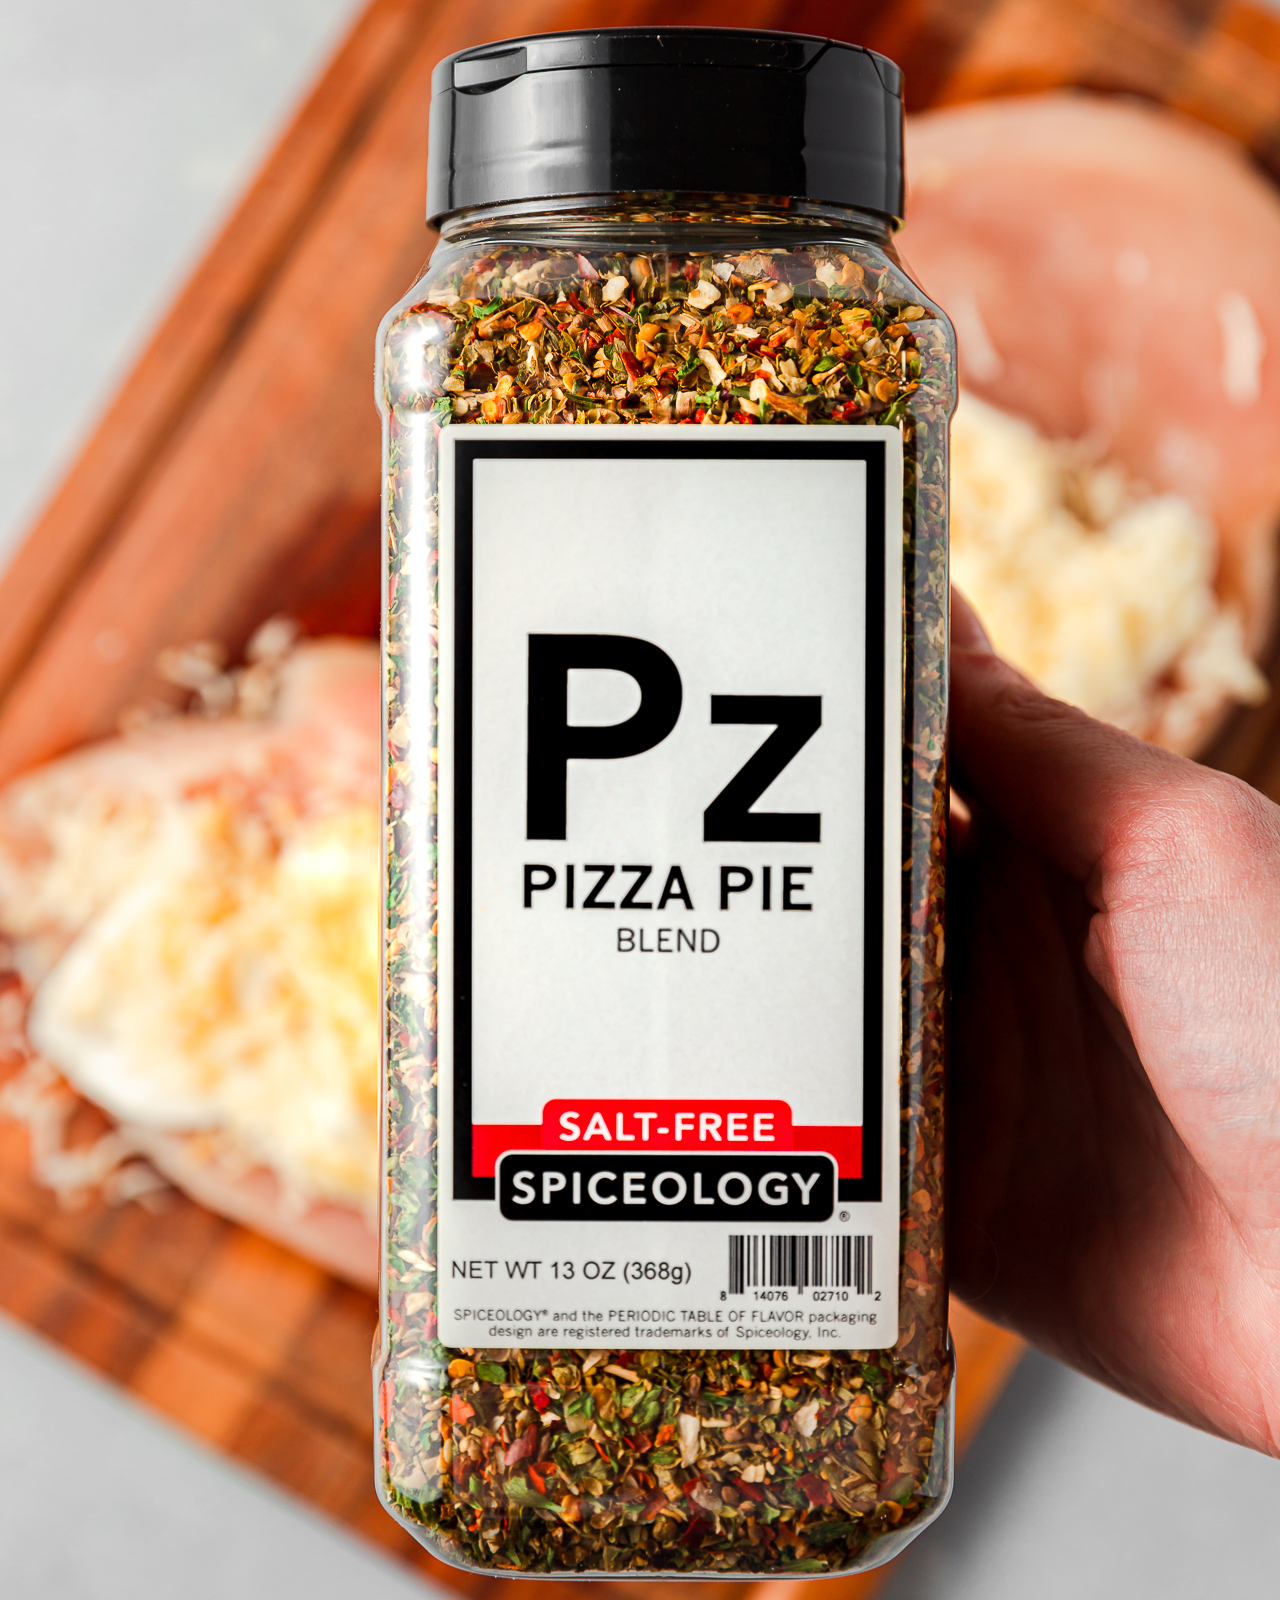 Spiceology Pizza Pie Spice Blend in a Jar